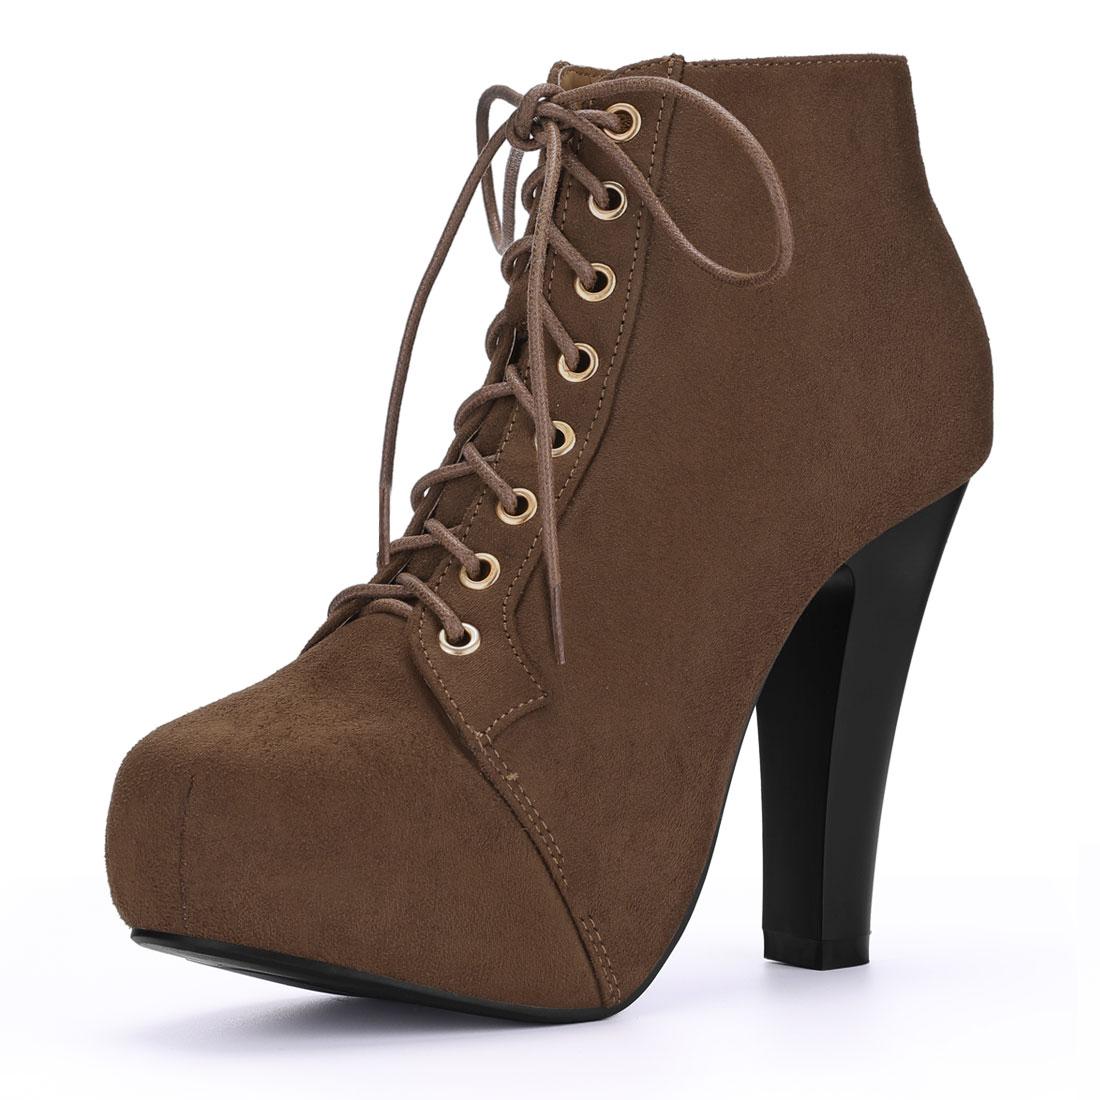 Women Round Toe High Heel Platform Lace Up Booties Coffee US 9